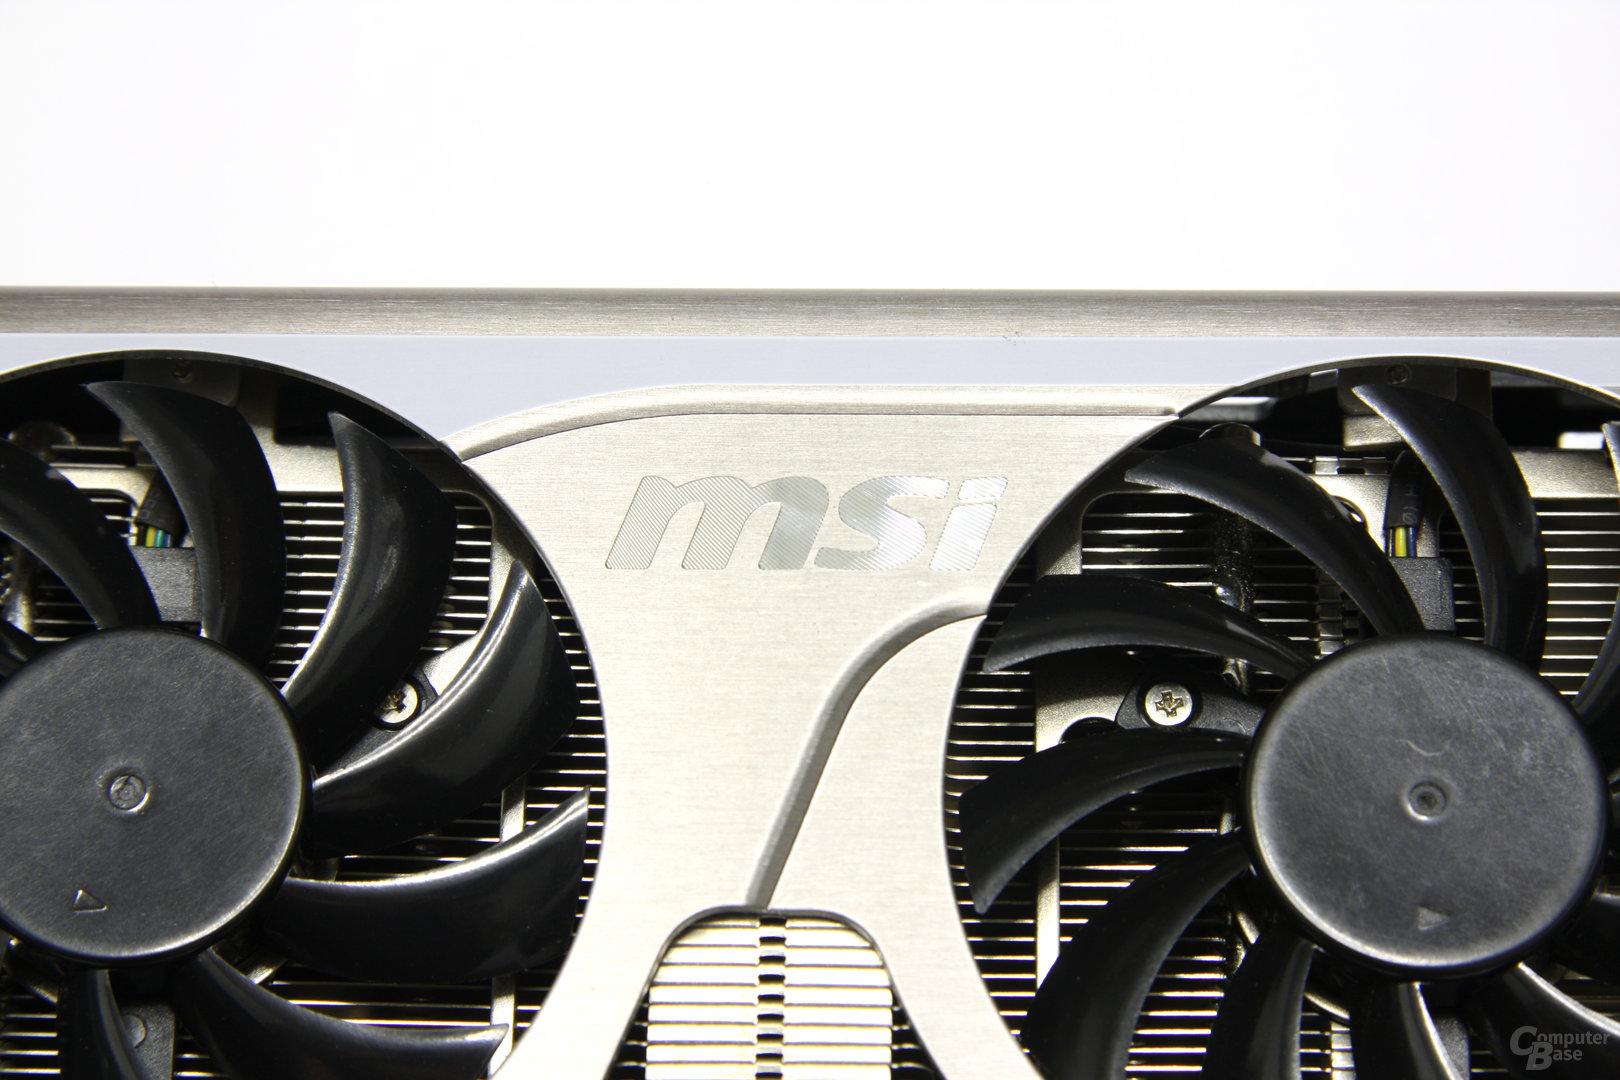 GeForce GTX 560 Twin Frozr II OC Schriftzug